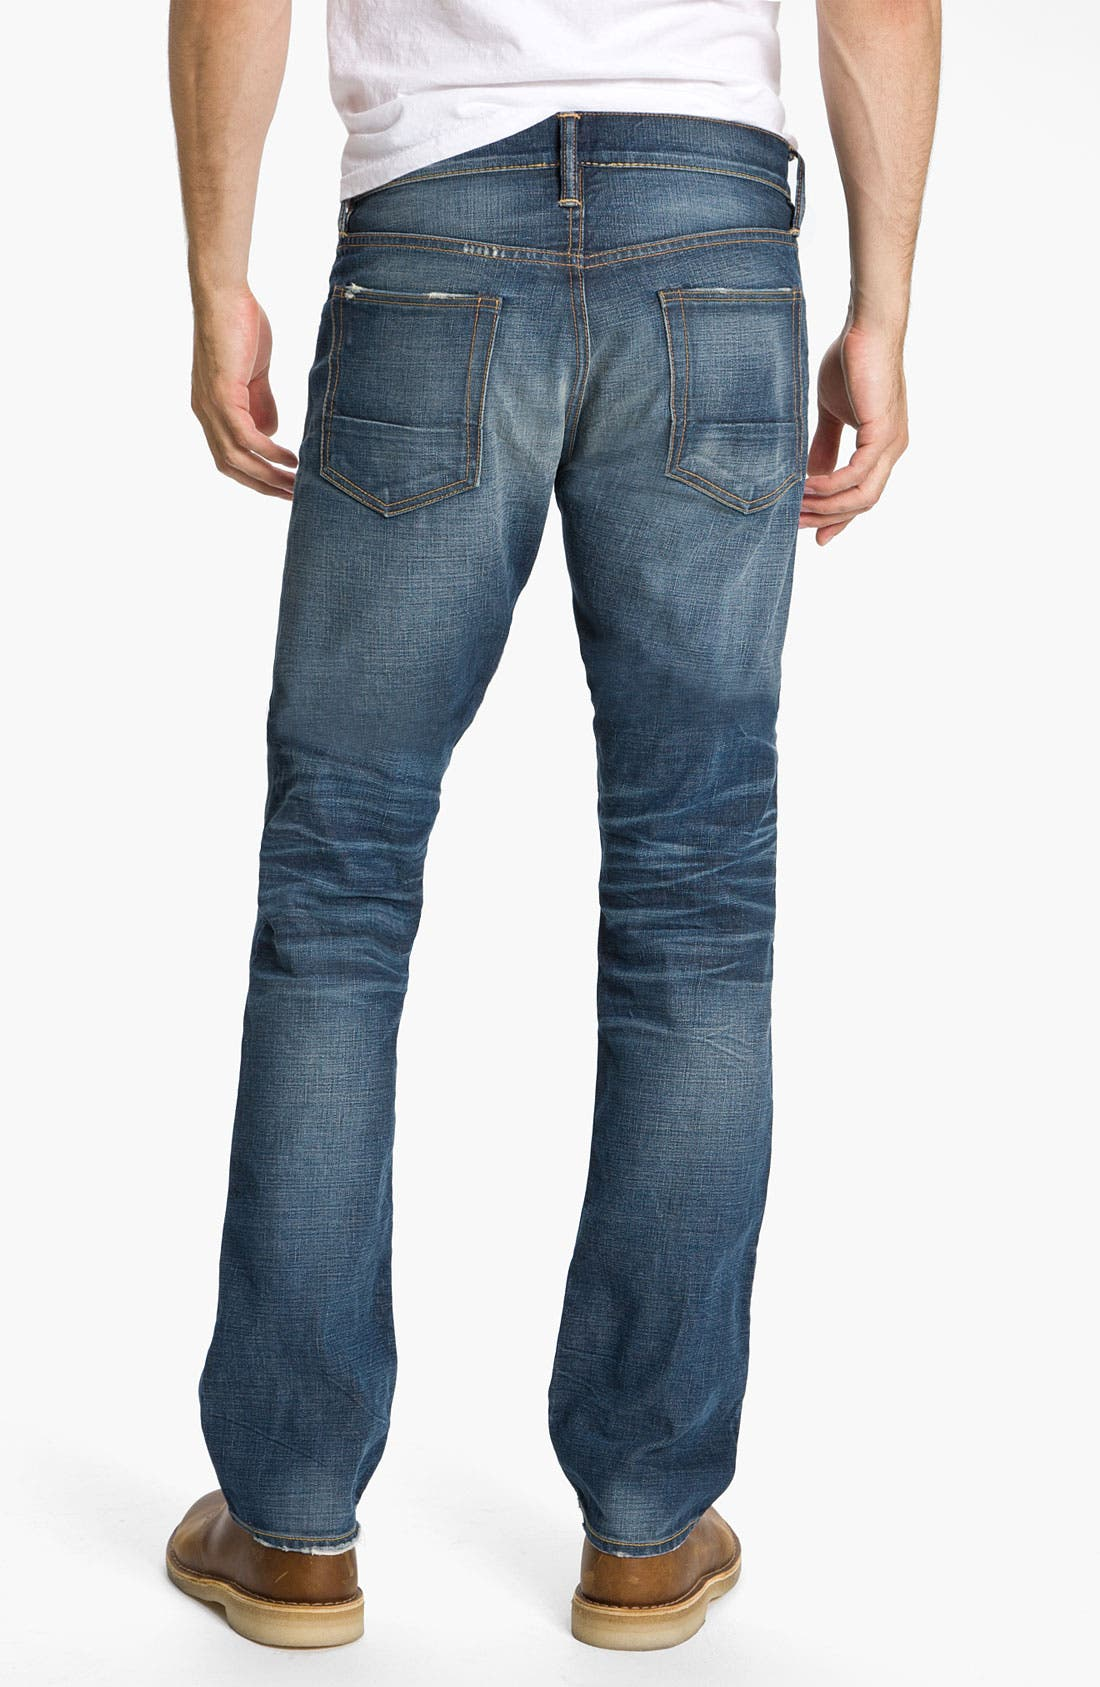 Alternate Image 1 Selected - NSF Clothing Straight Leg Jeans (Reno)